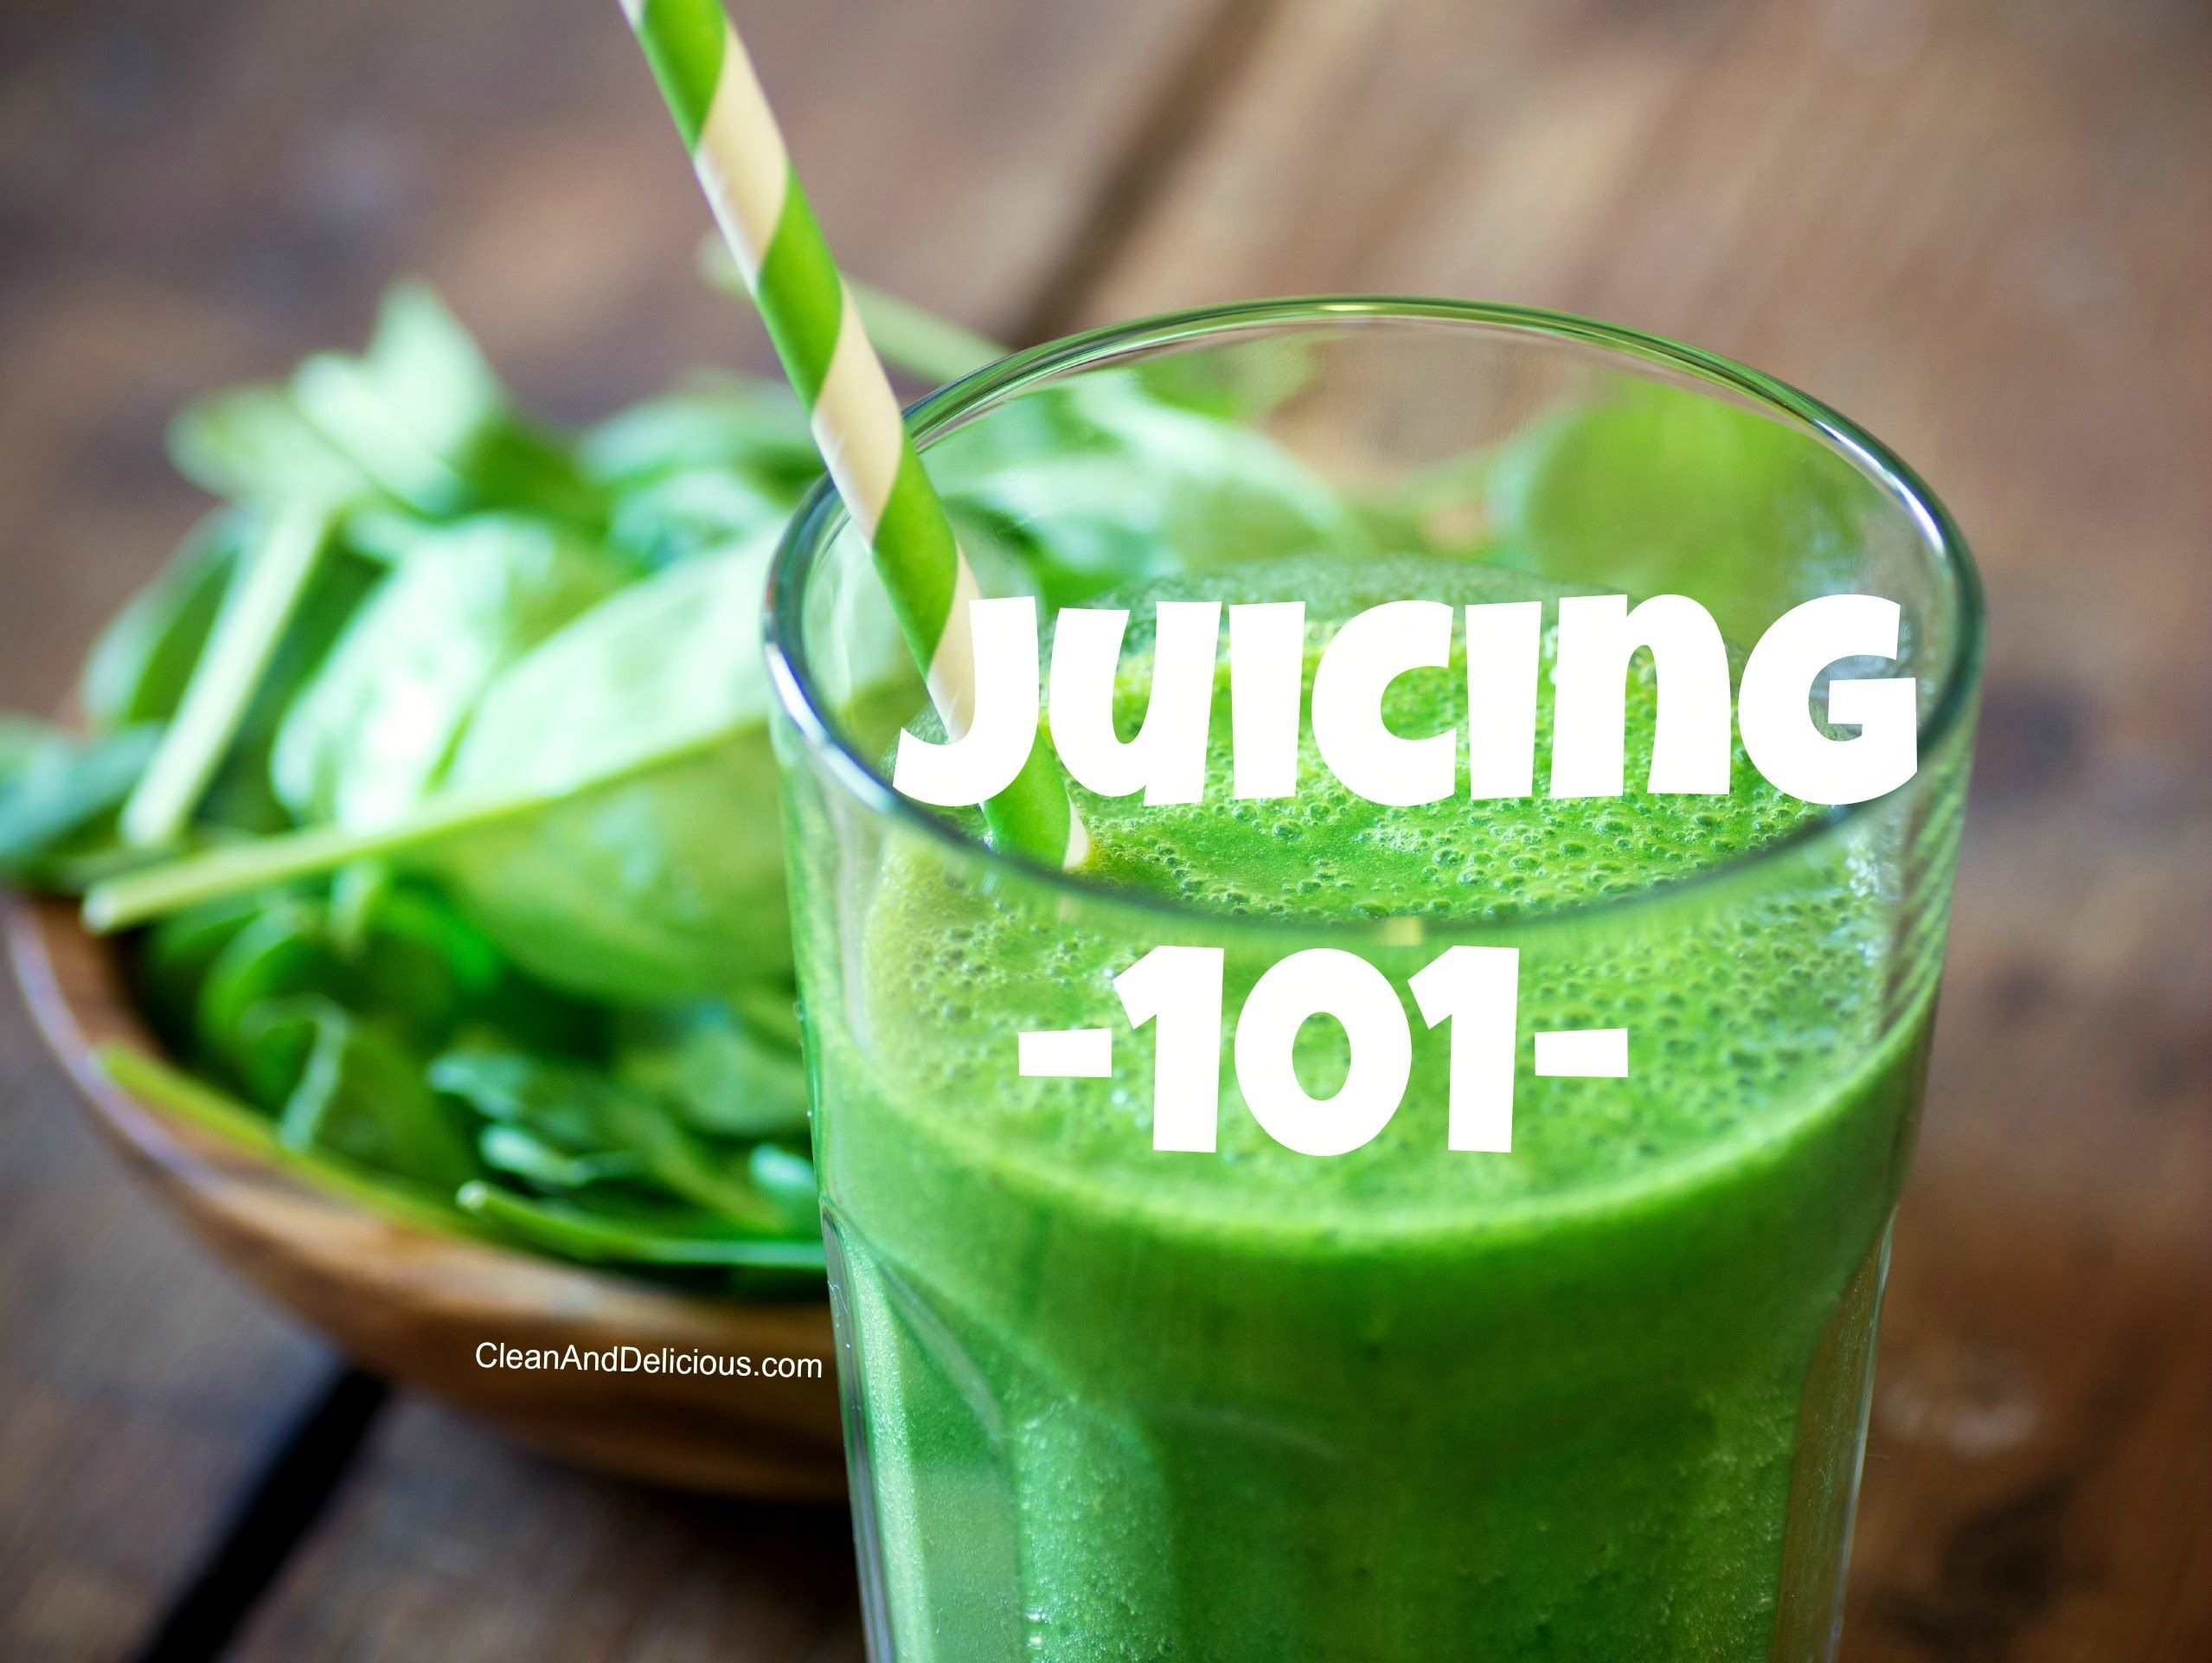 Juicing 101 - A Beginners Guide To Juicing + Juicers